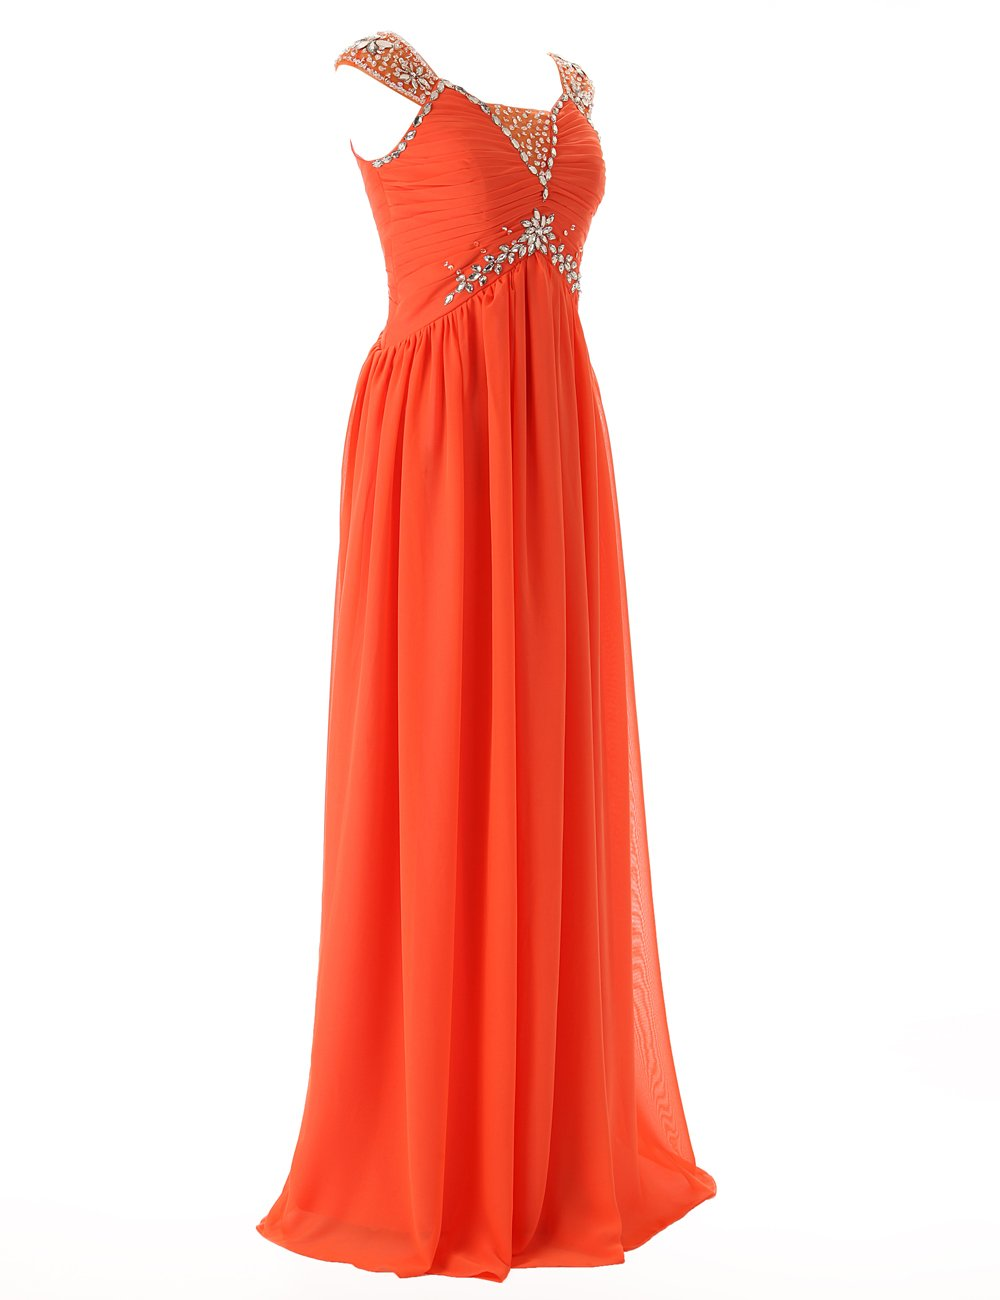 143ddfc096e83 当ストアでいろいろなドレスがあり、結婚式ドレス、二次会、パーティー、演奏会、披露宴などの各種パーティーにおすすめなドレス!